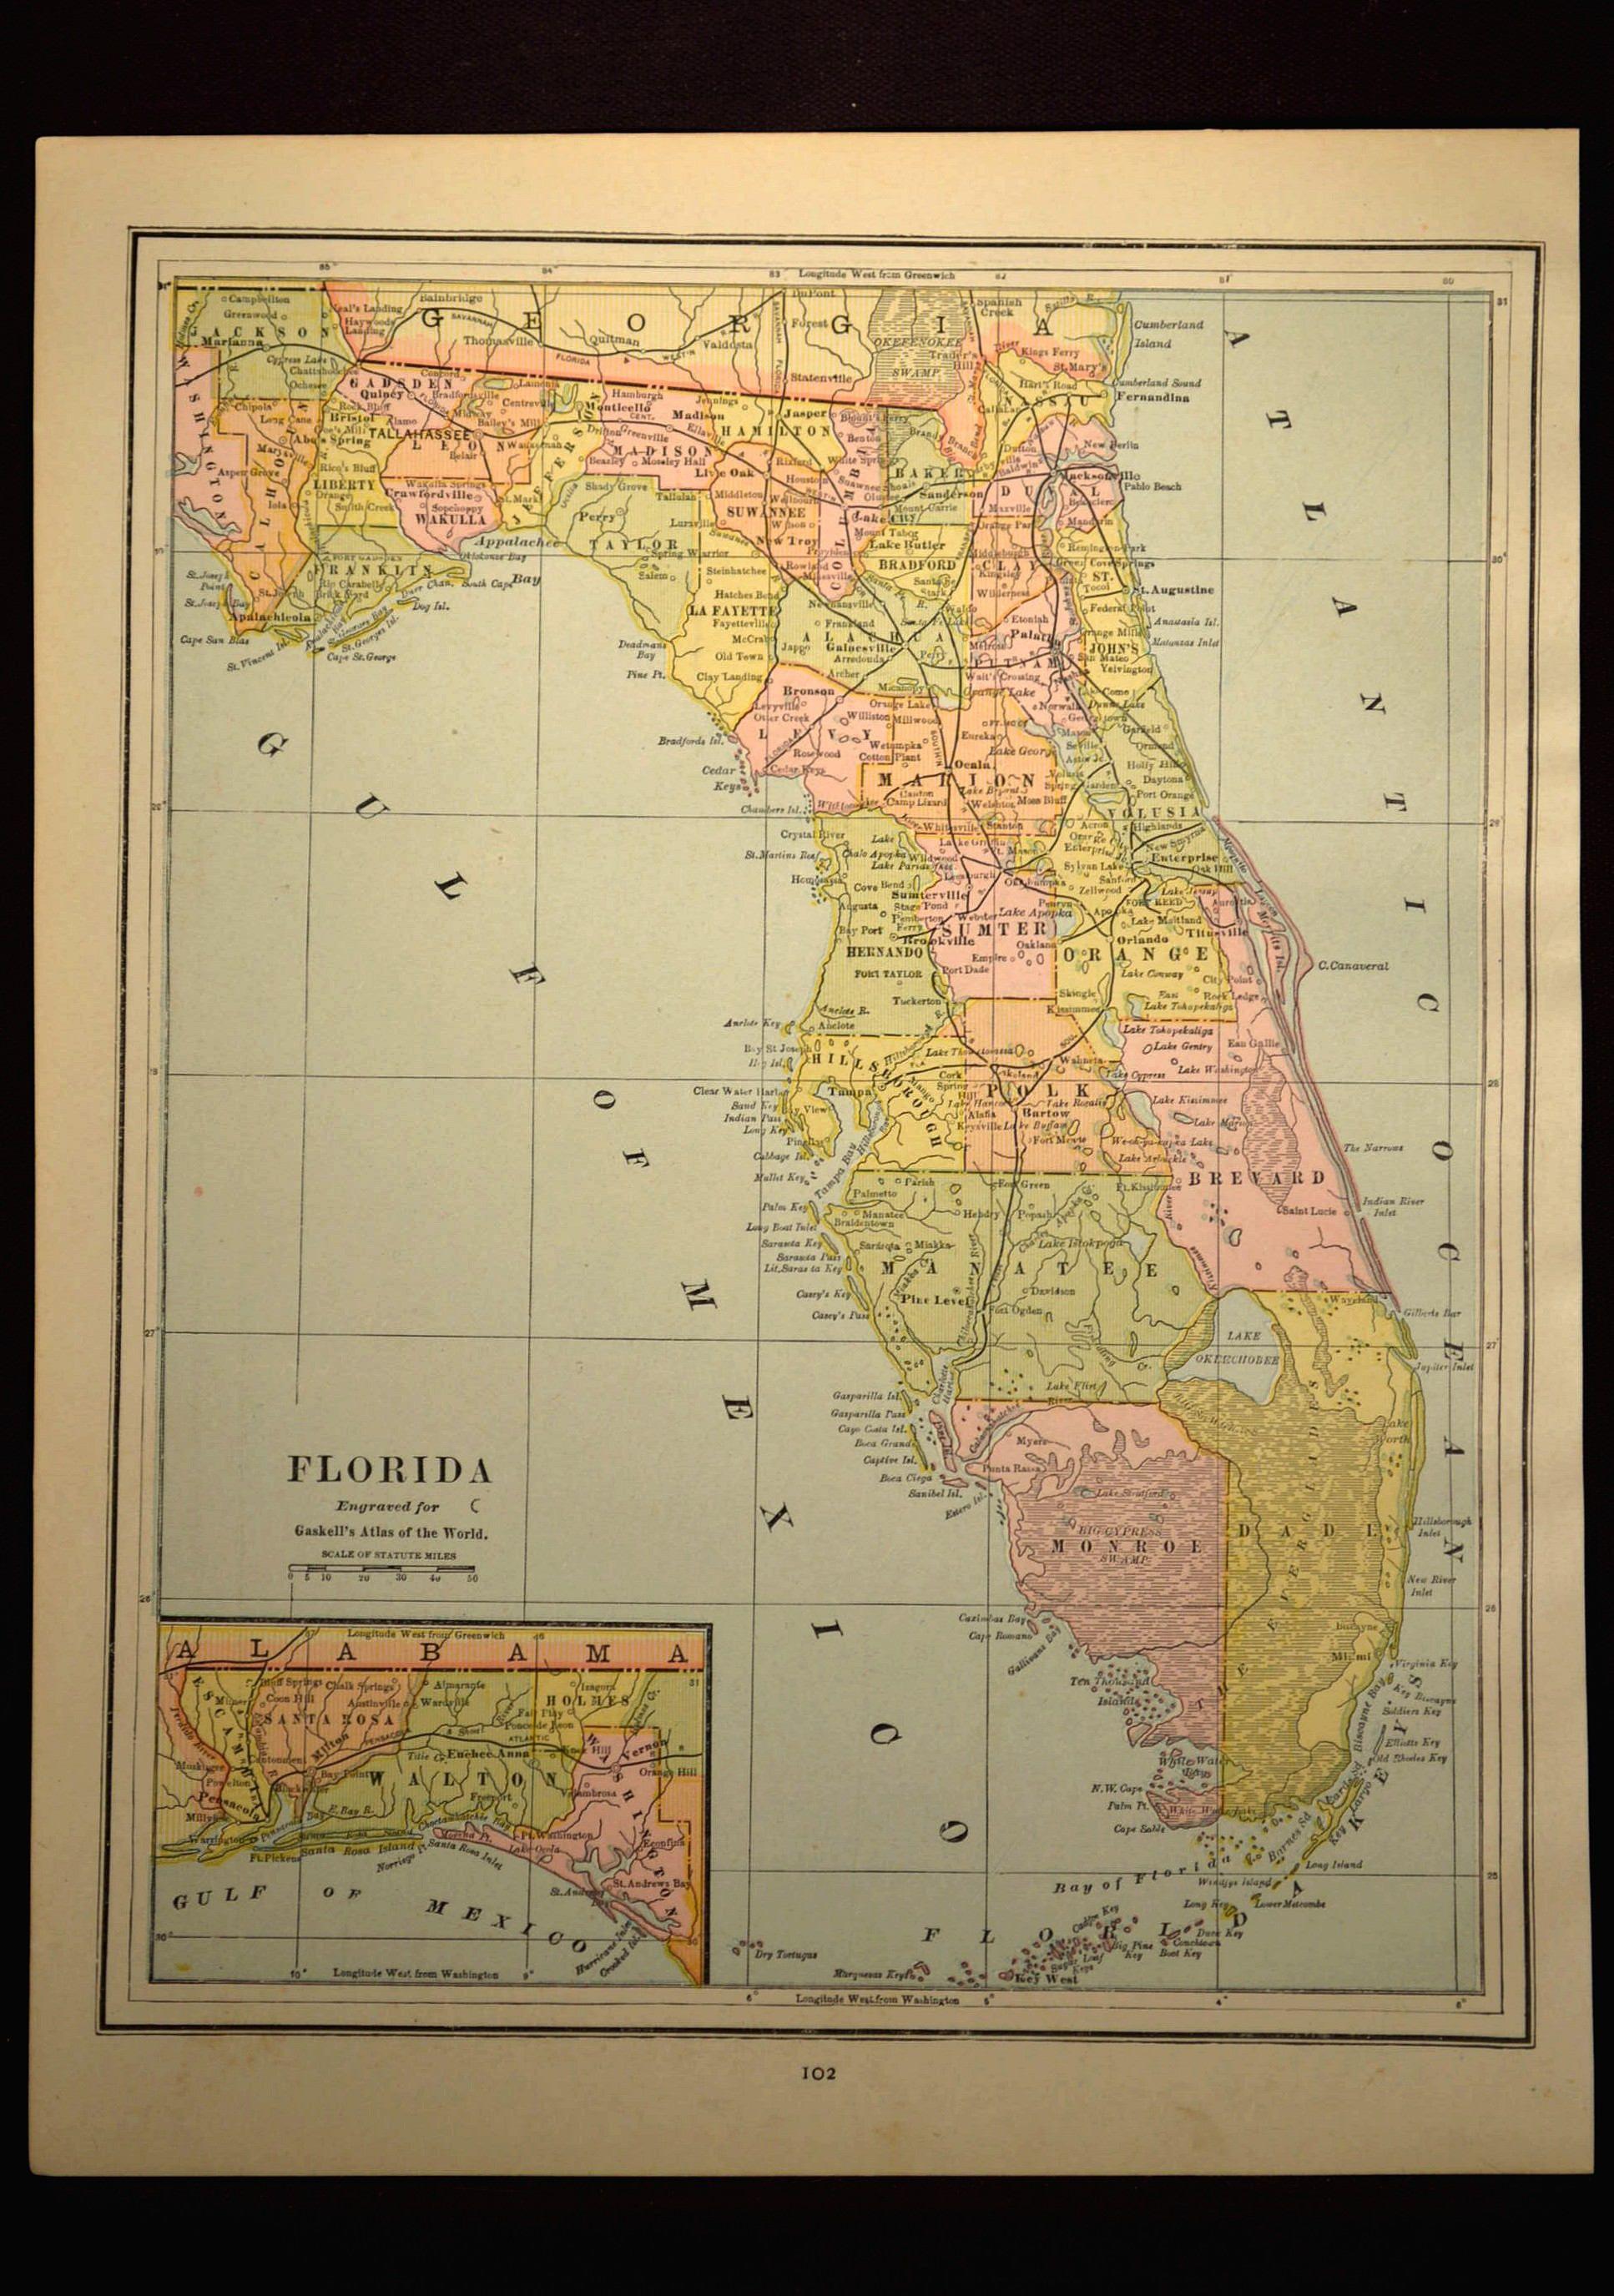 Antique Florida Map Of Florida Wall Decor Art Original Gift Idea - Map Of Florida Wall Art